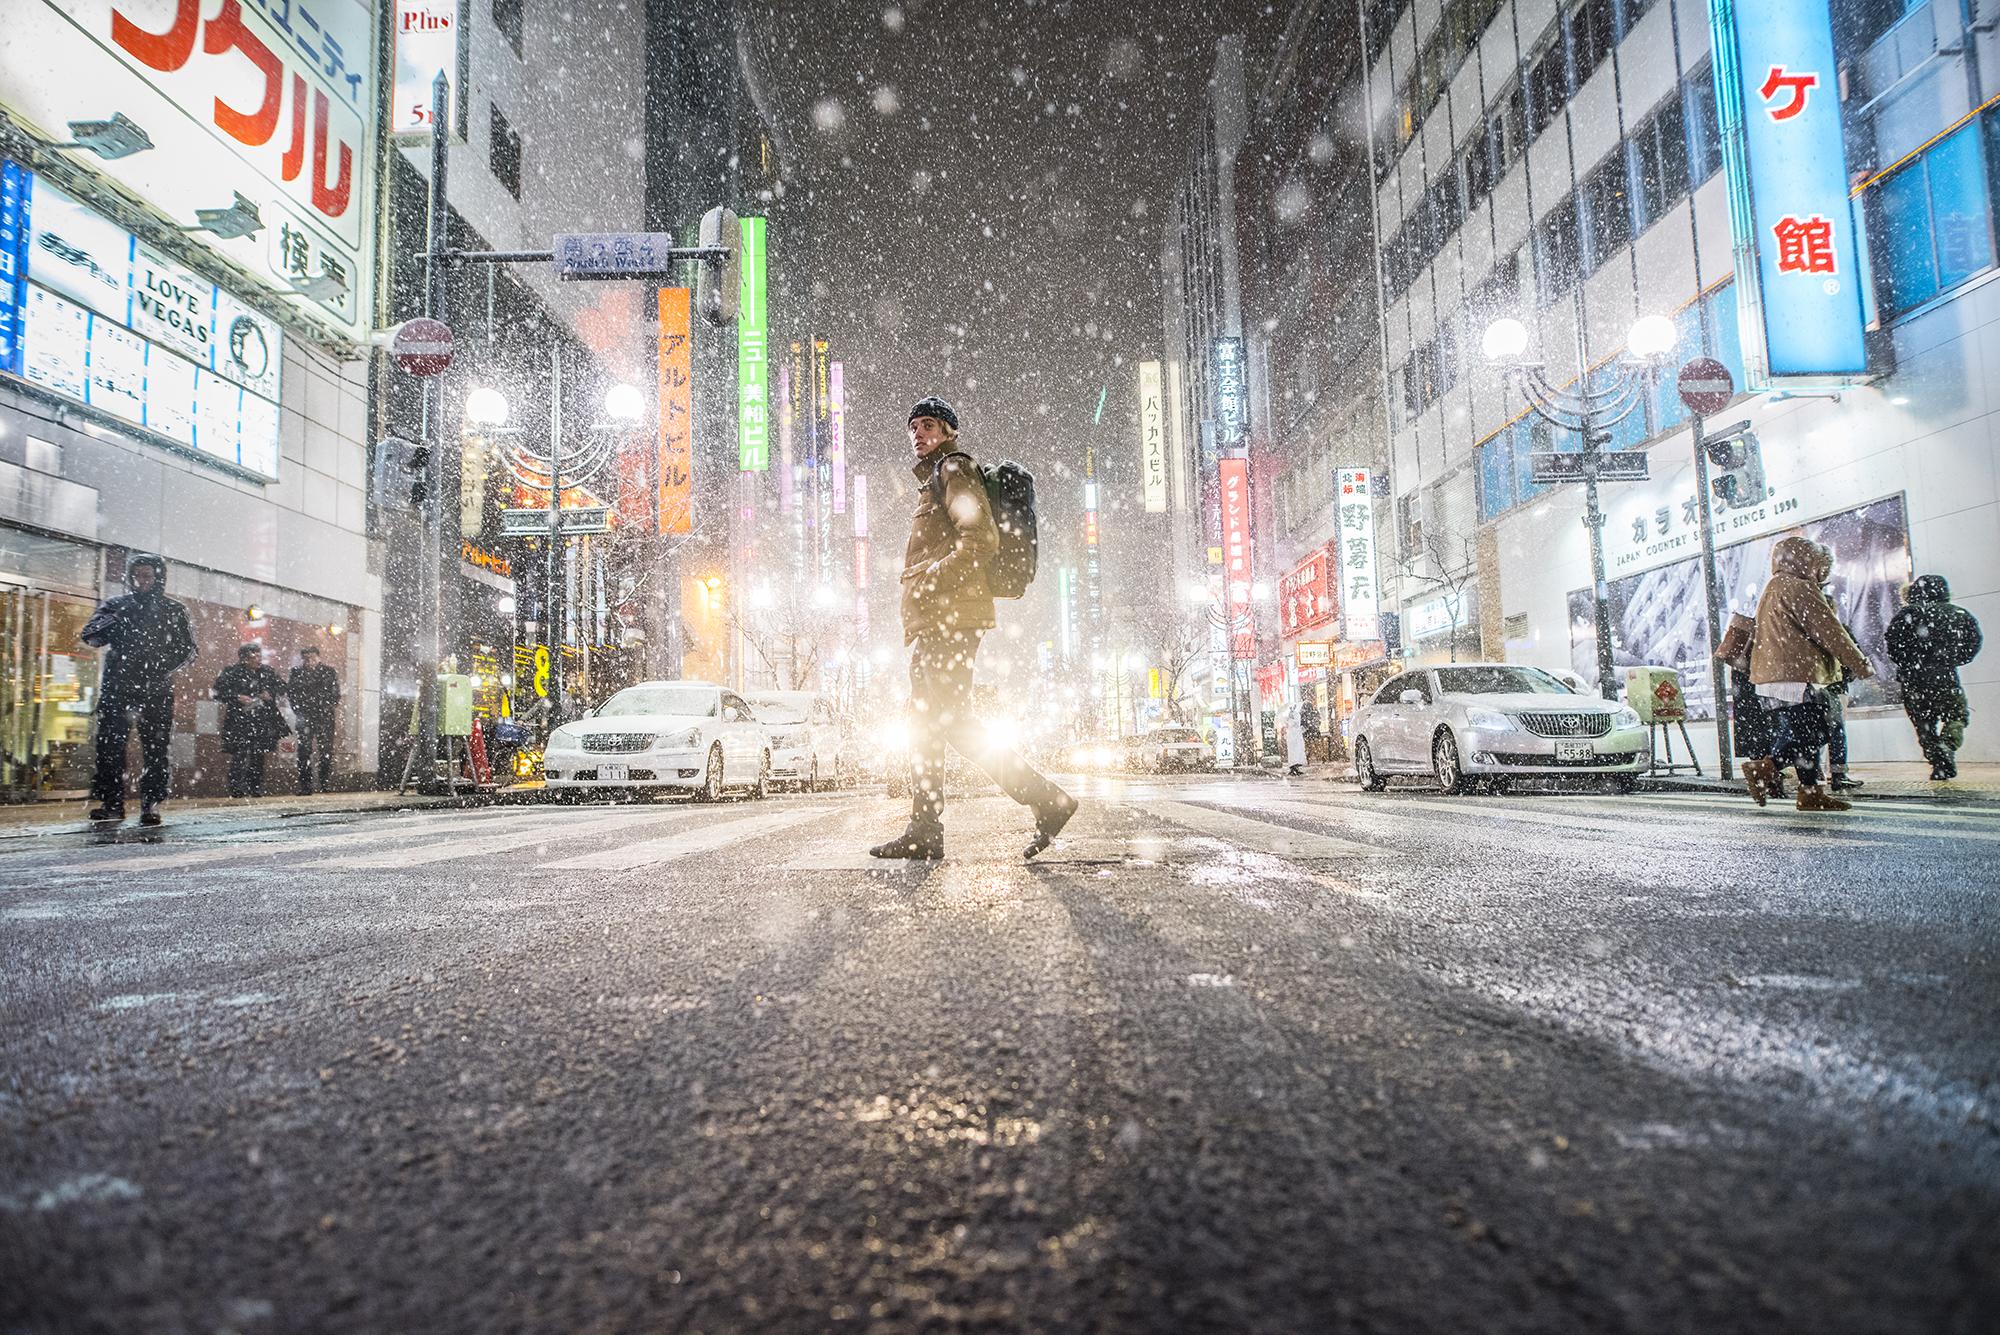 Blake Paul. Sapporo, Japan. Photography by Tim Kemple.